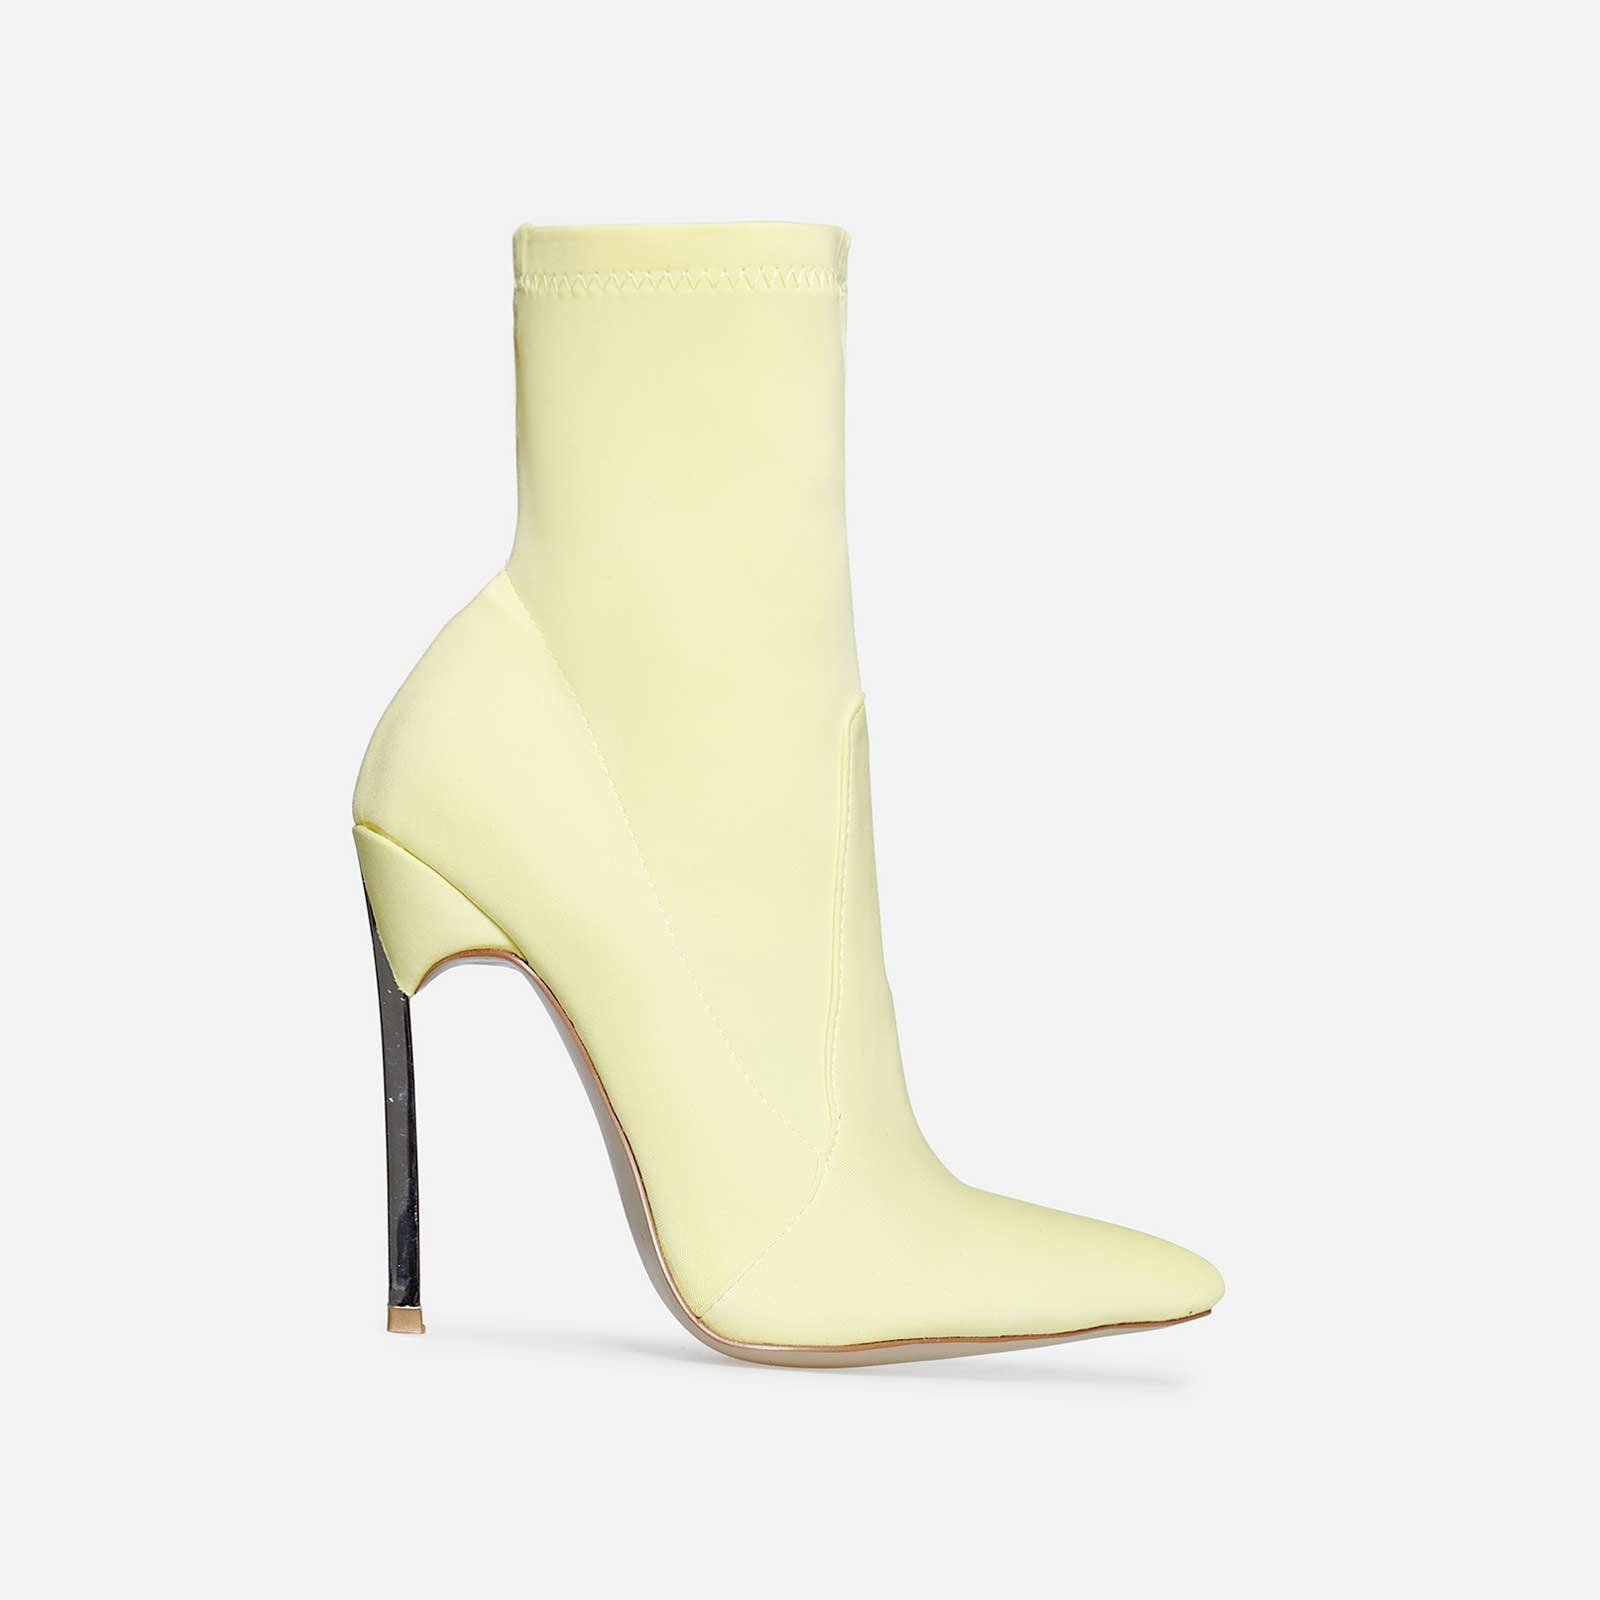 Ava Skinny Heel Pointed Toe Sock Boot In Lemon Yellow Lycra